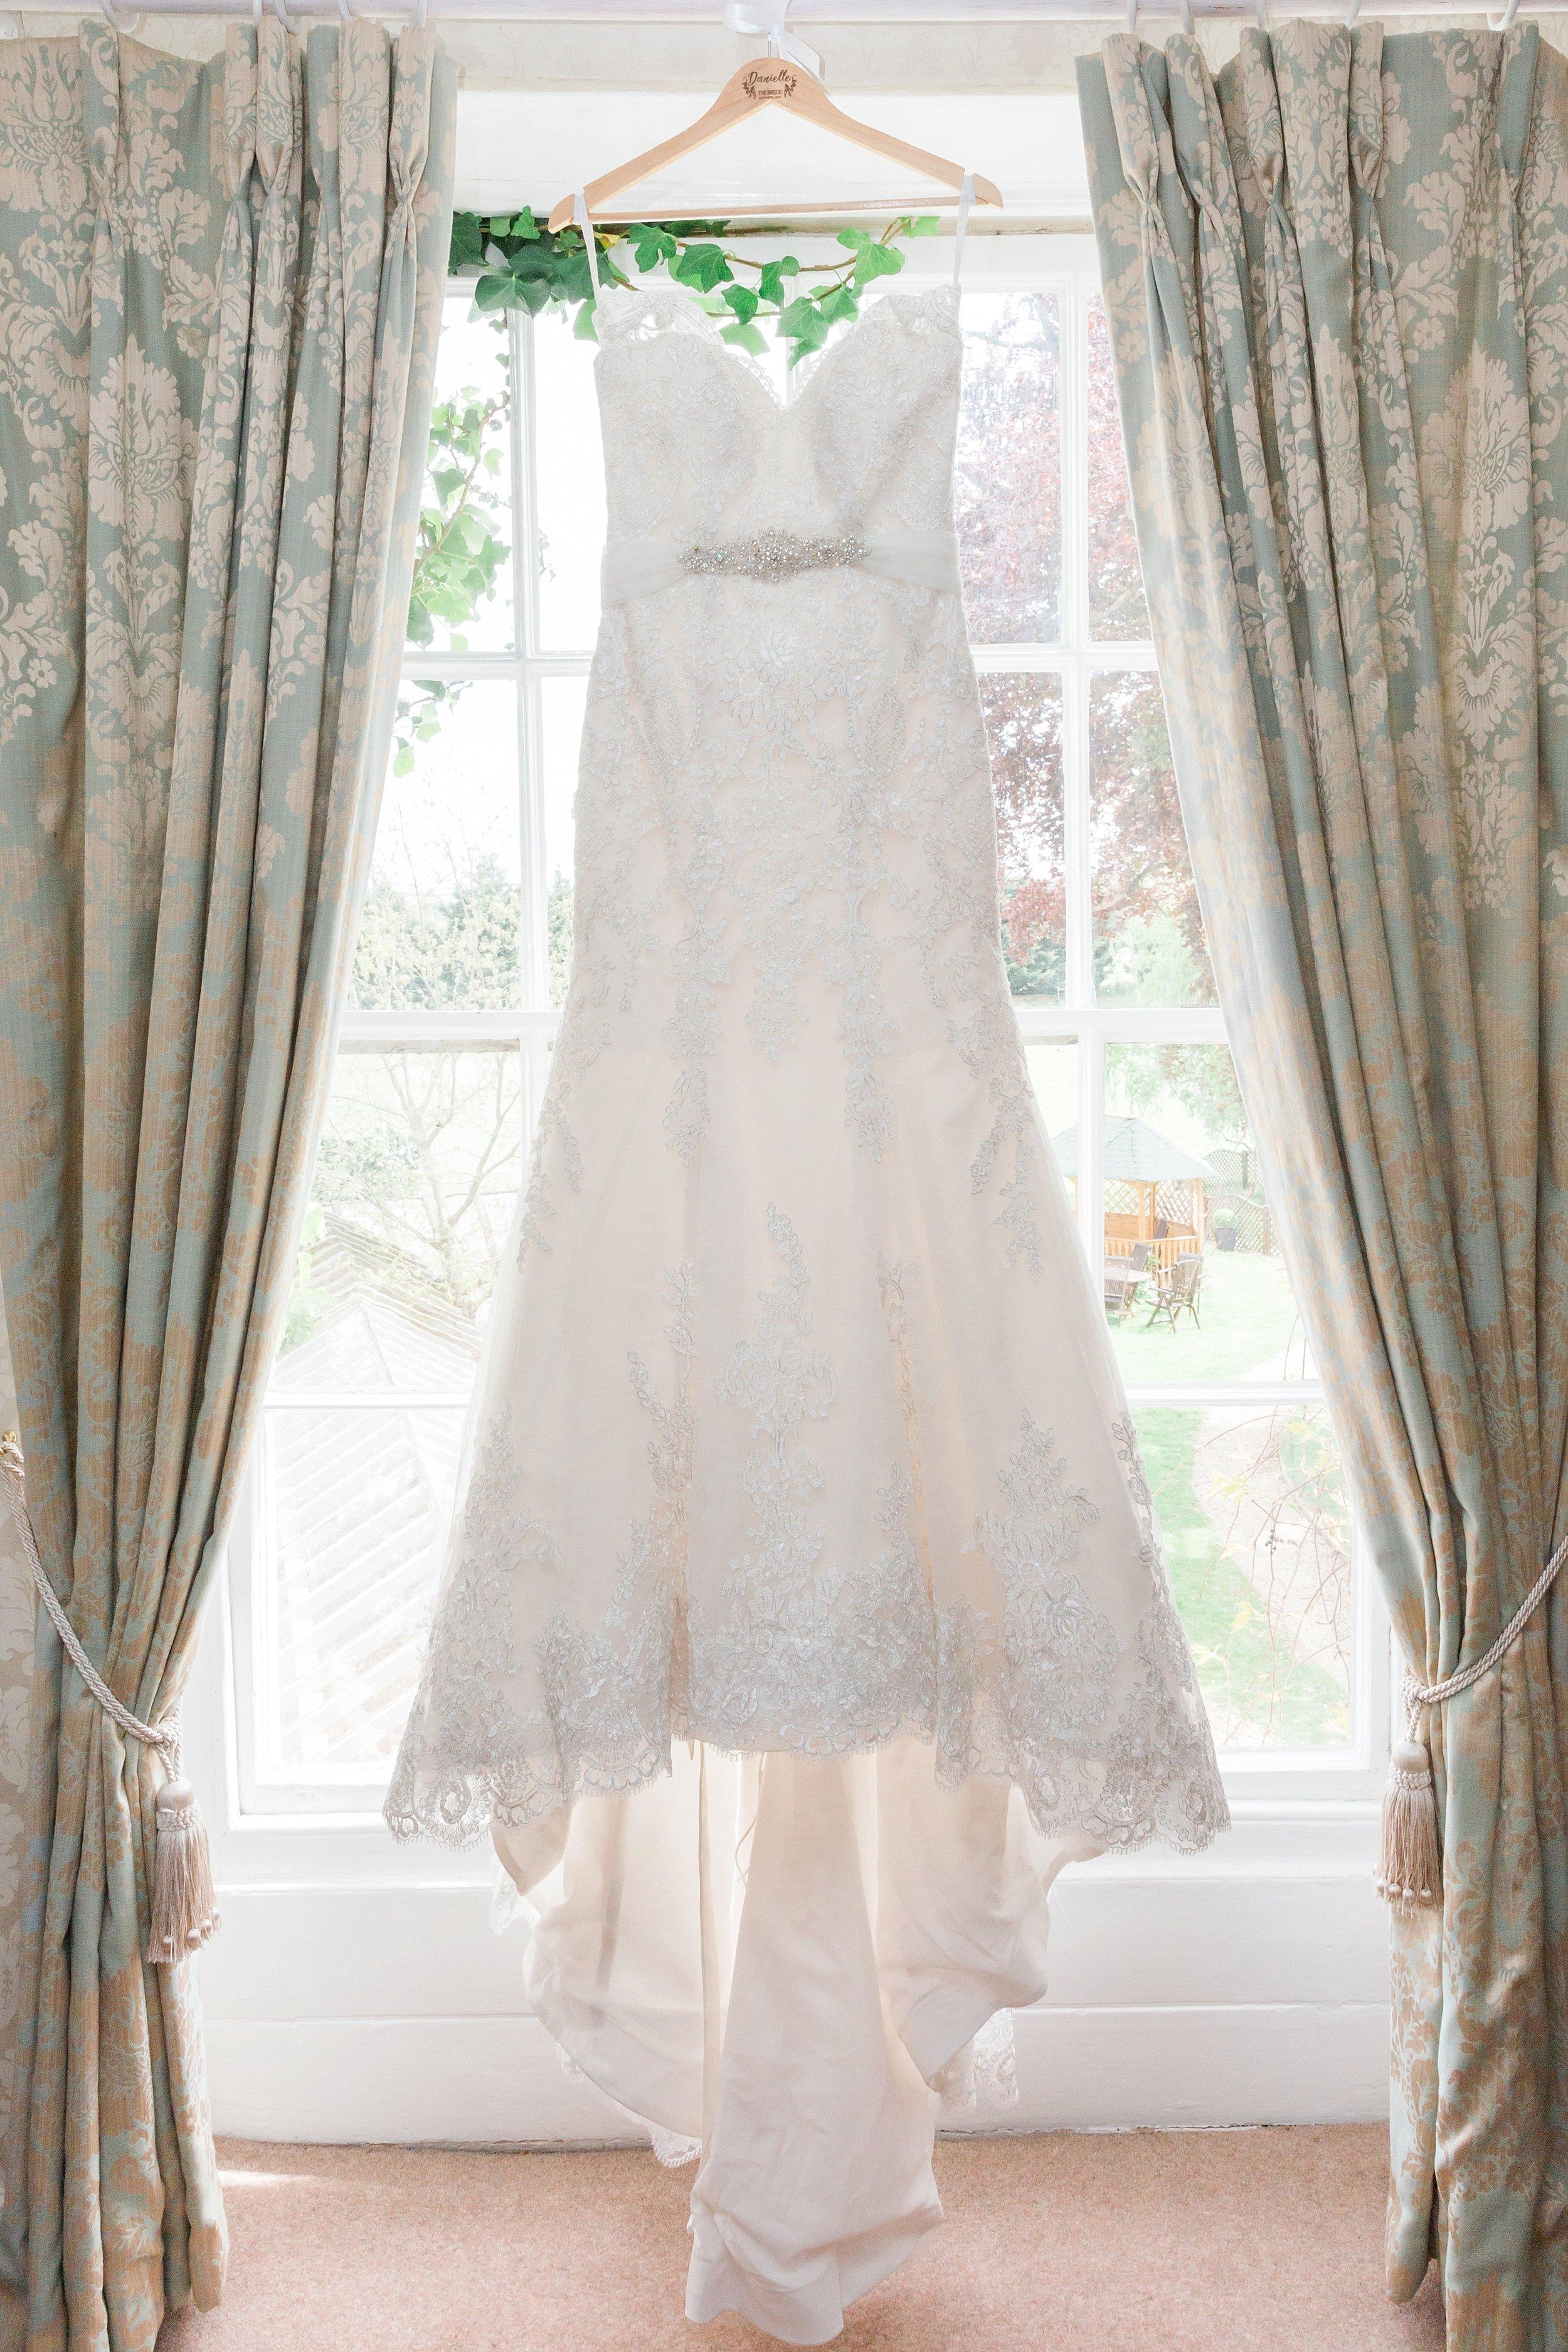 anna sorrano wedding dress.jpg